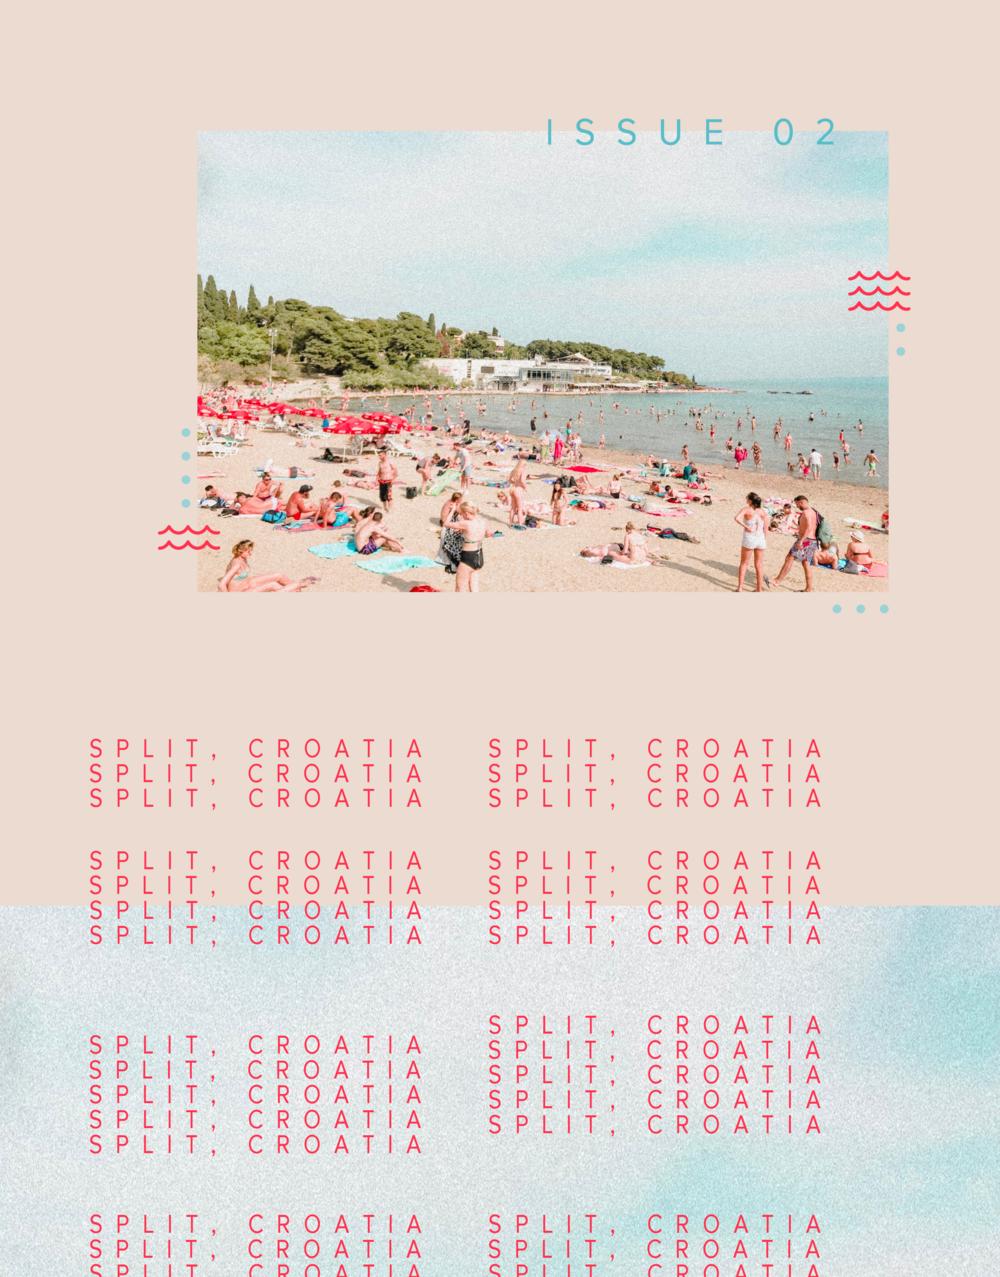 Split Postcard (Adobe Photoshop 2018)